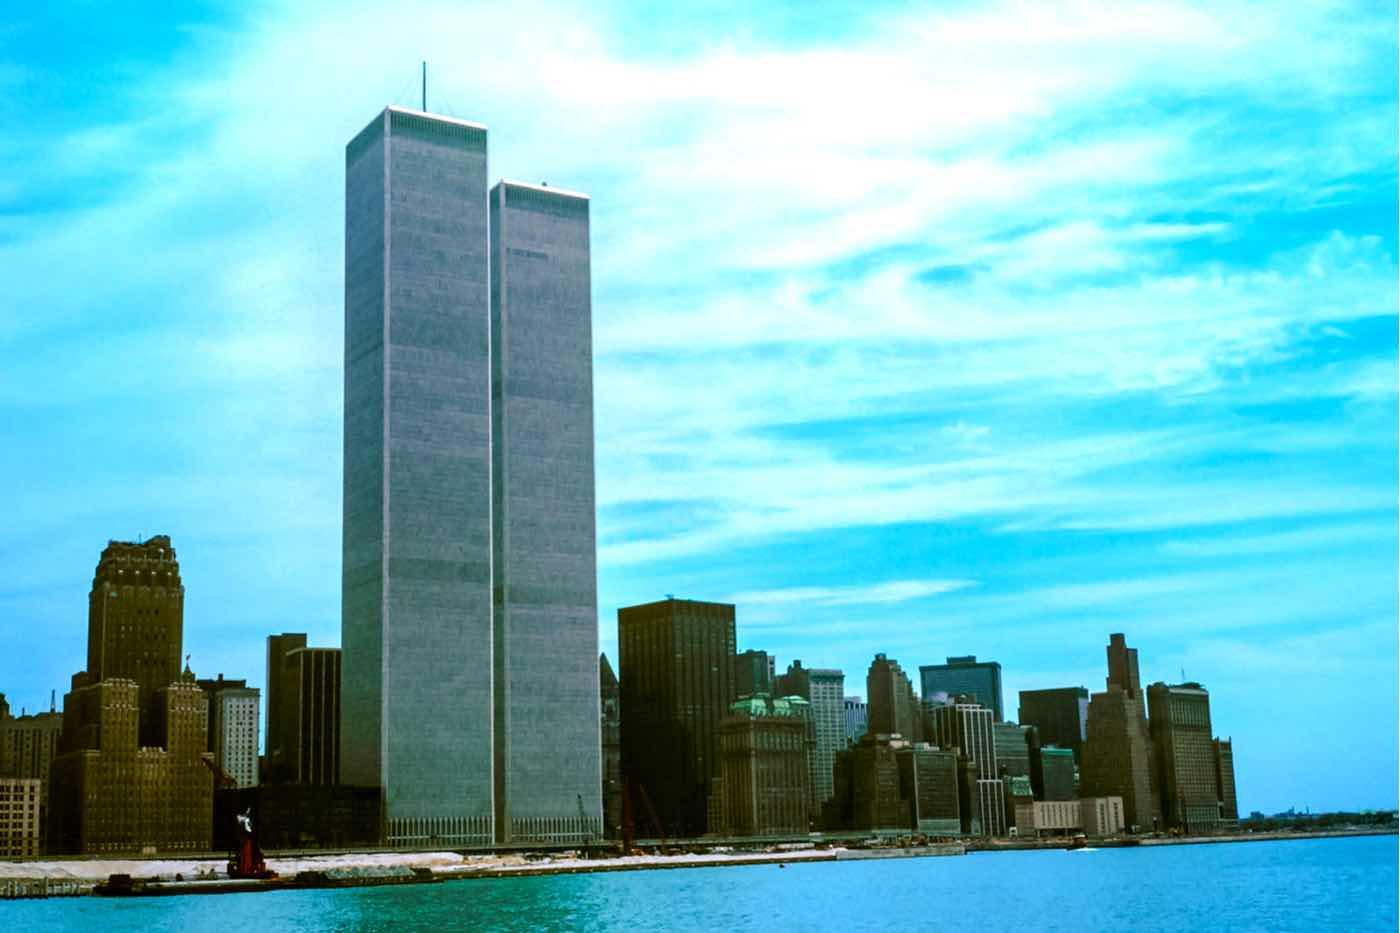 Ataques a las Torres Gemelas: El 11 de septiembre